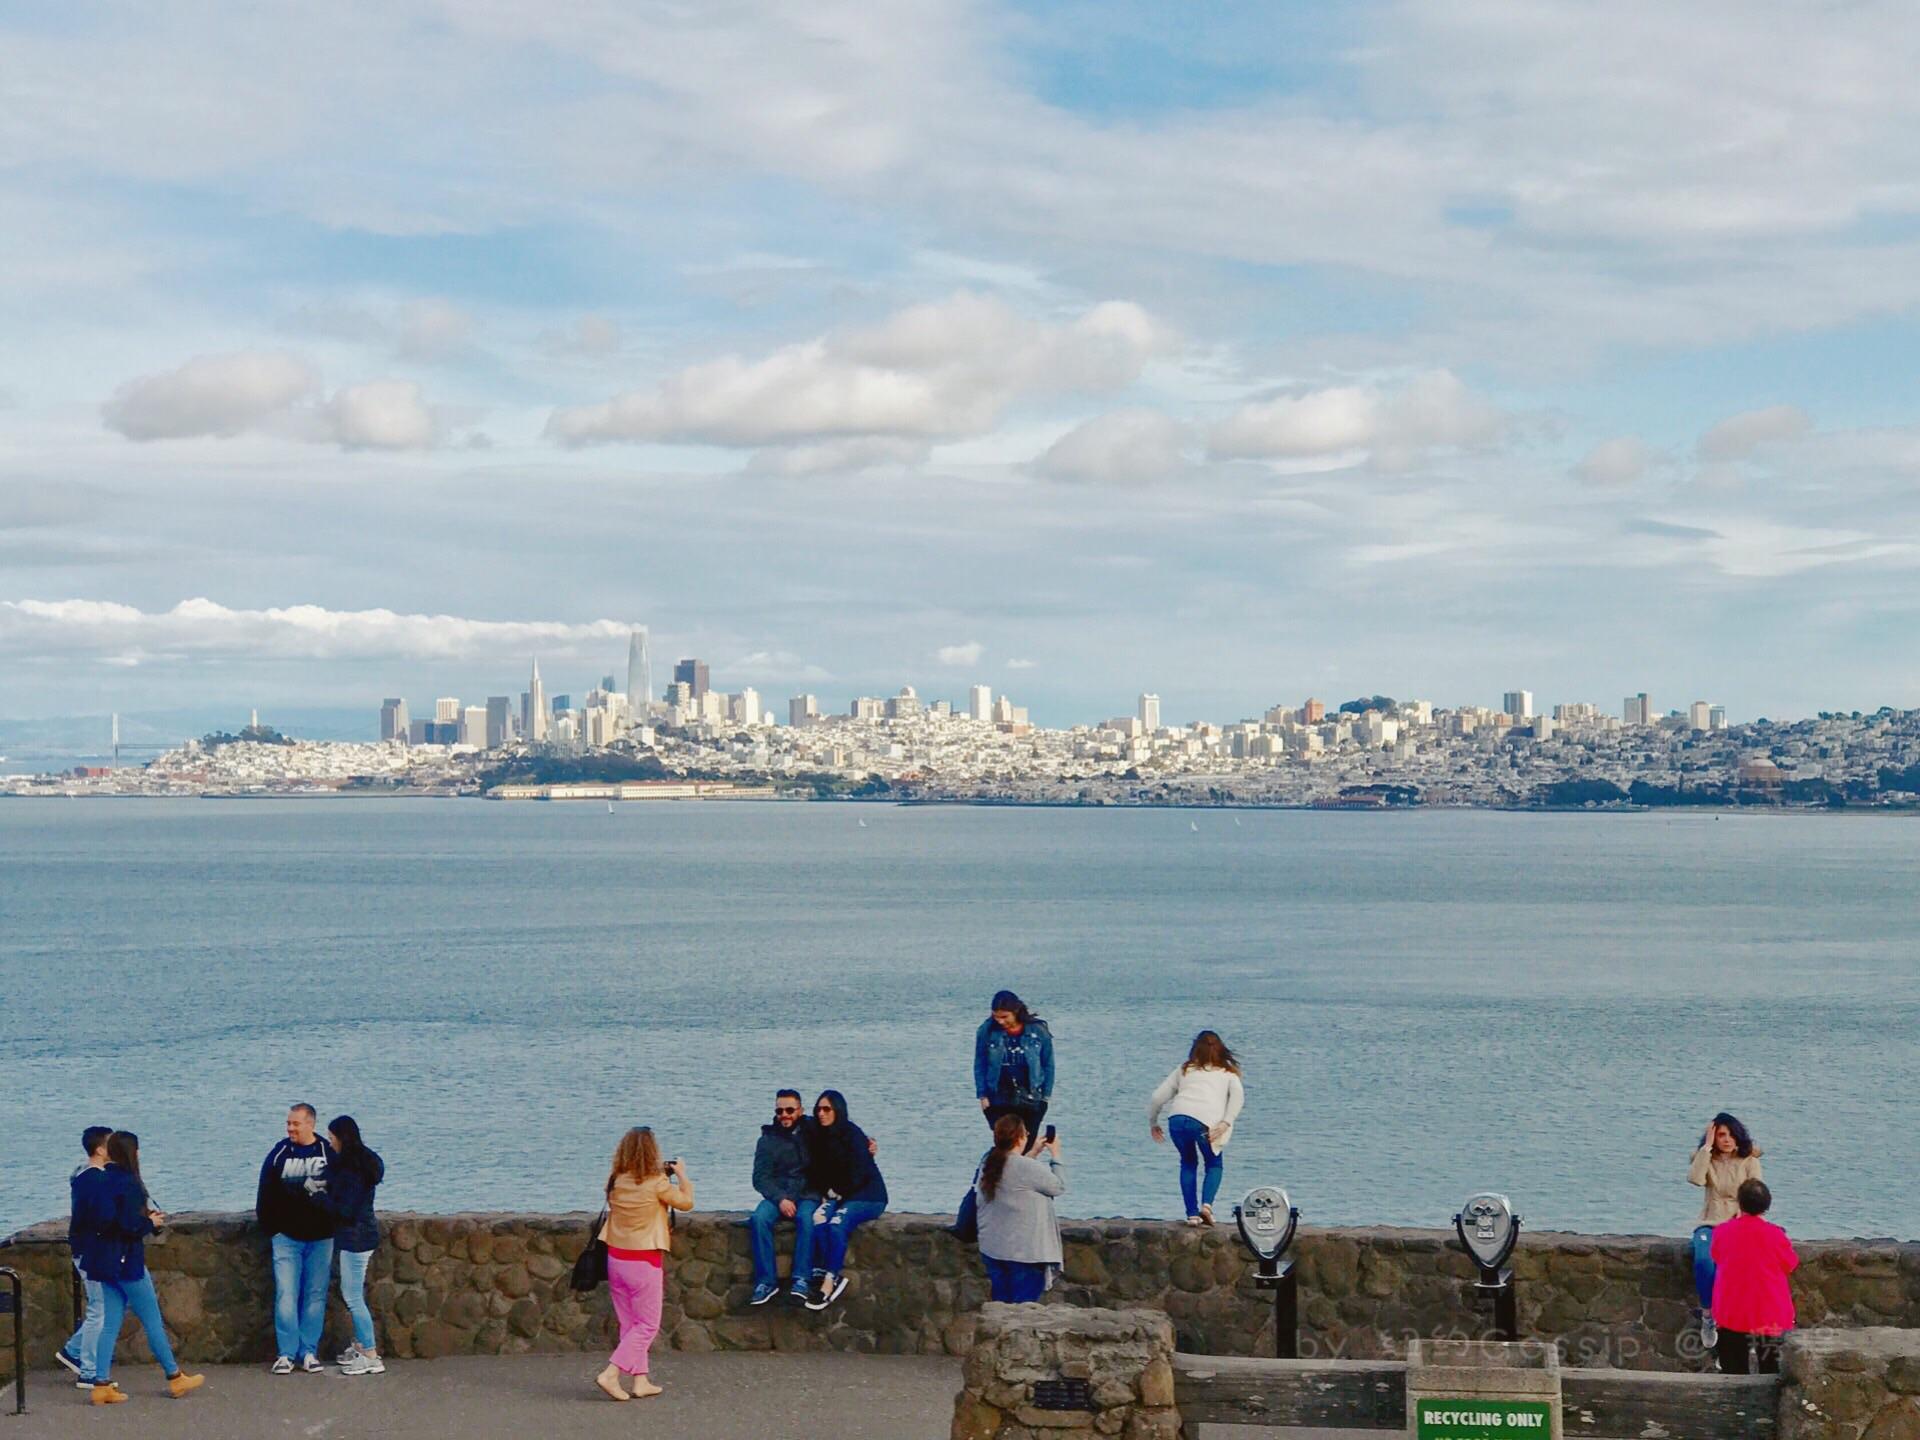 Big Bus San Francisco Attractions San Francisco Travel Review Travel Guide Trip Com